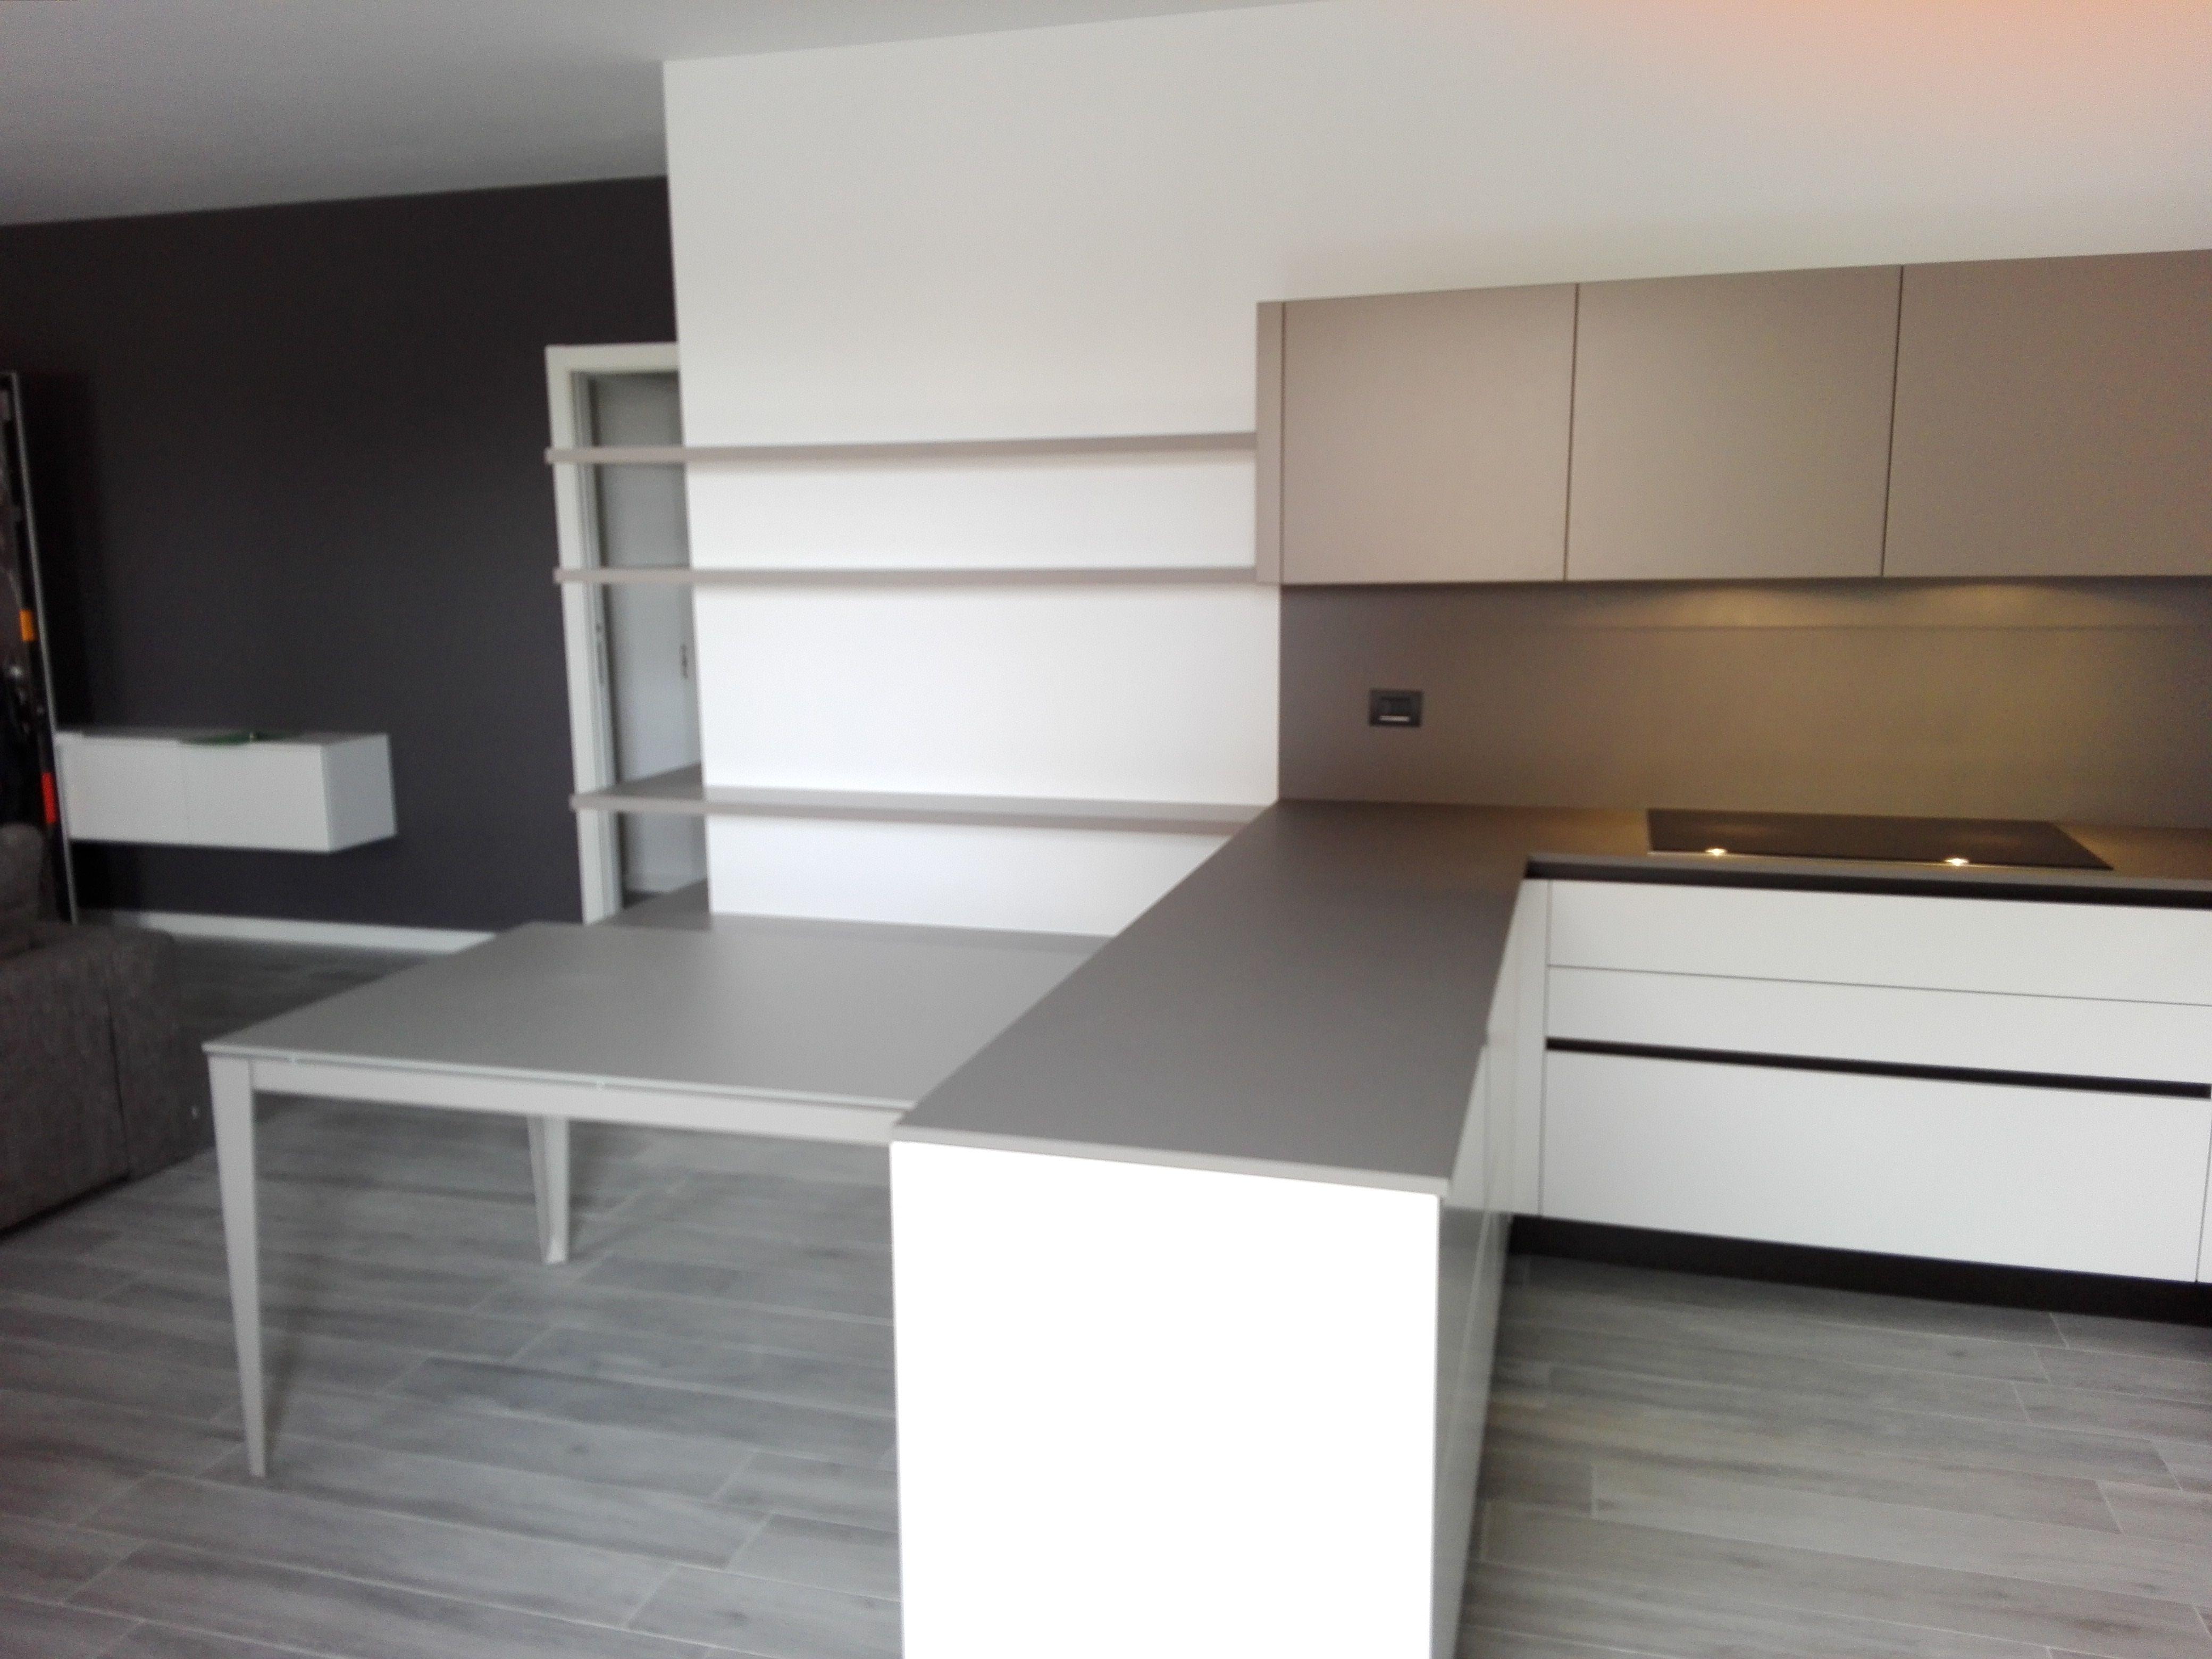 Cucine a penisola interior design cucina euromobil con isola with cucine a penisola il - Euromobil cucine opinioni ...